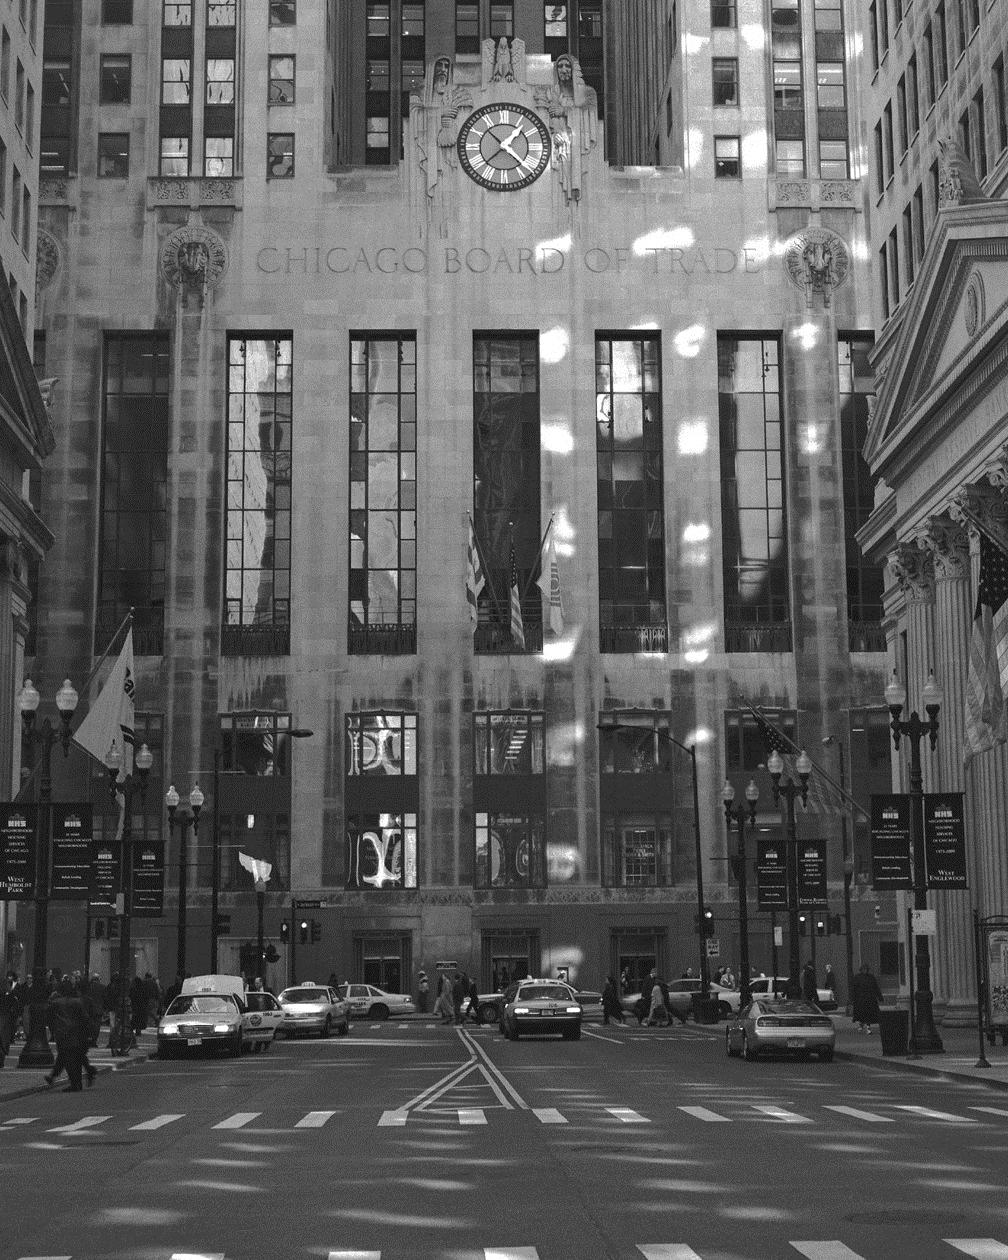 Chicago Black White Wallpaper Board Of Trade Looking Down La